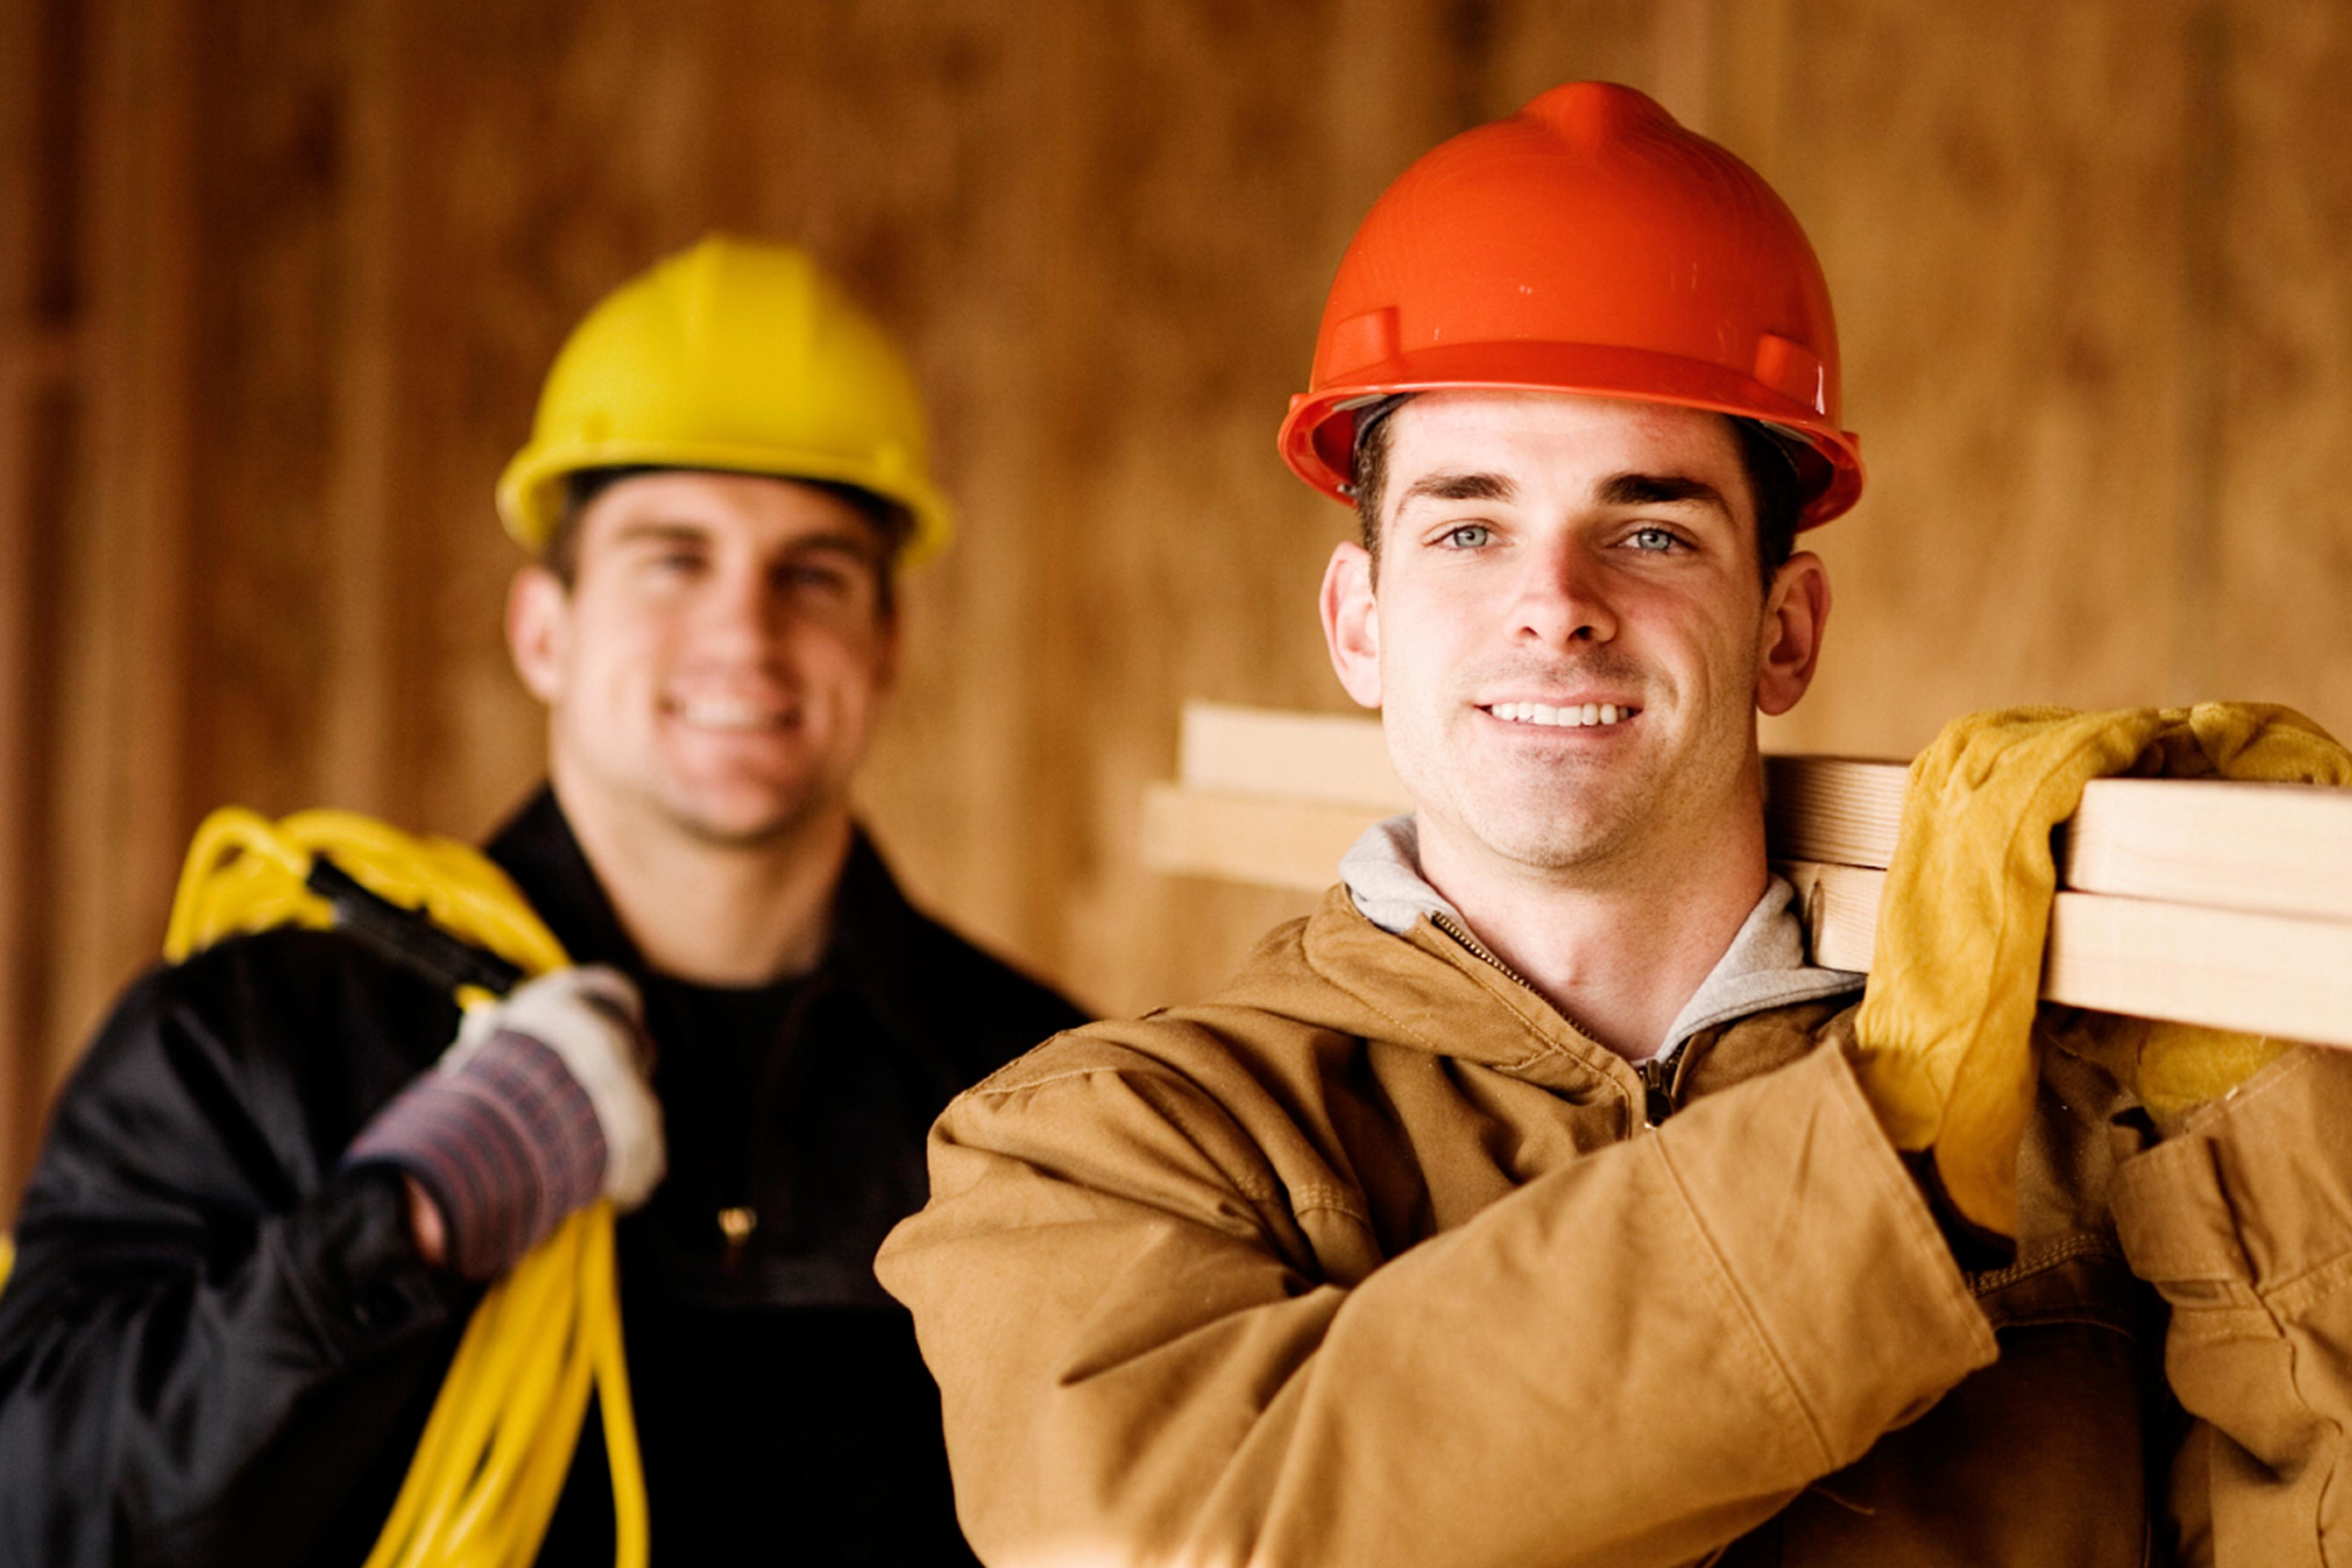 Trusted Handyman Contractor